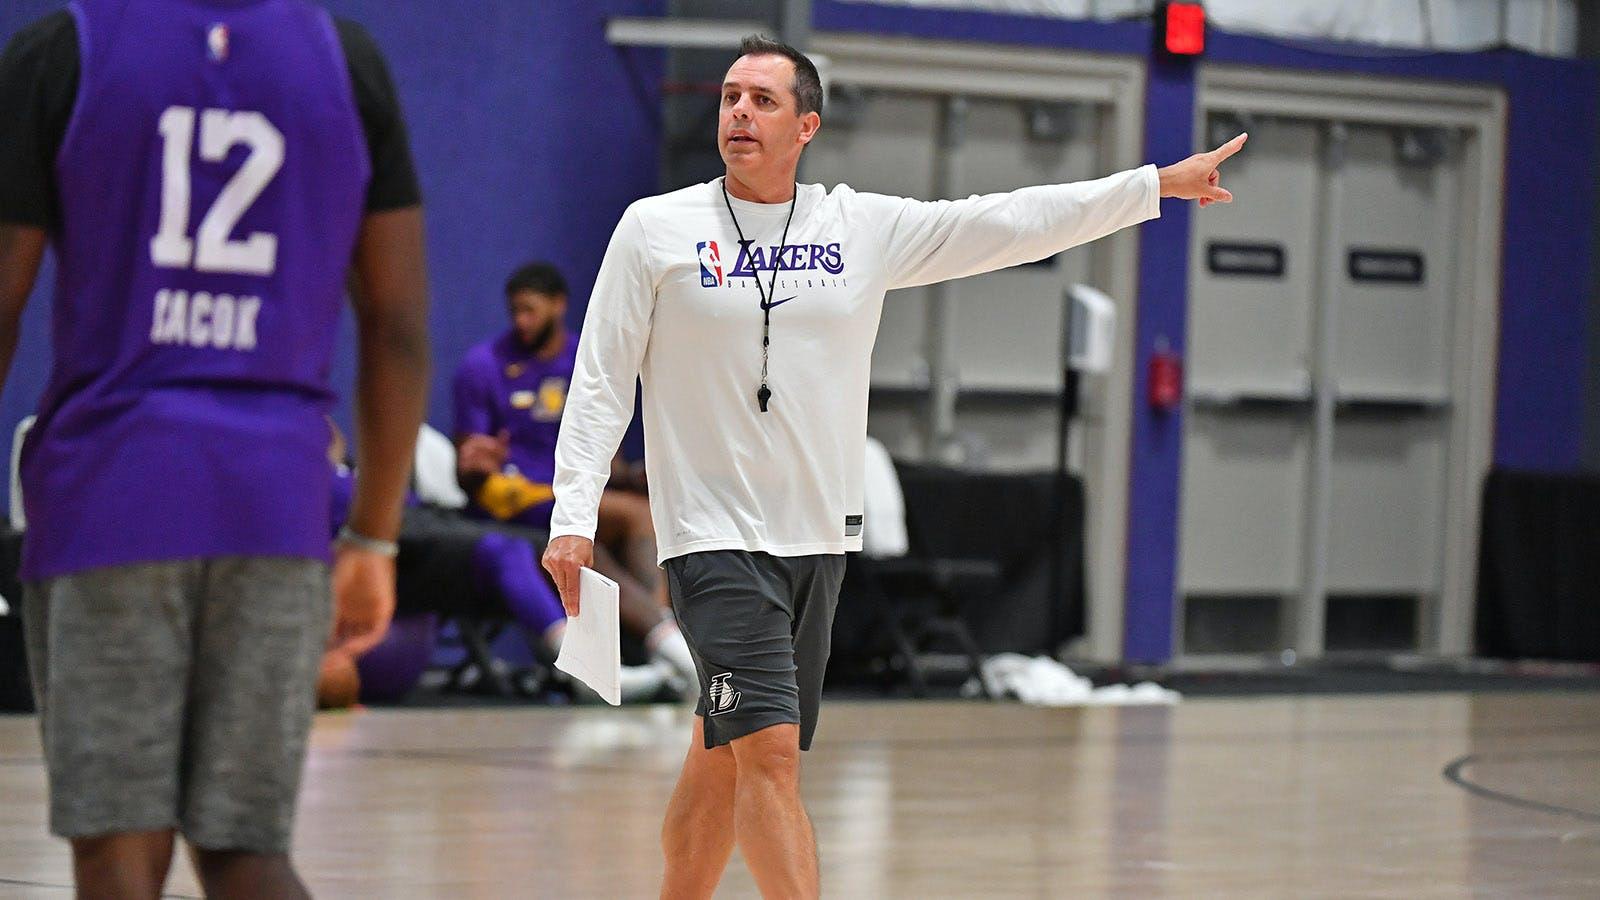 Frank Vogel sprona i suoi Lakers